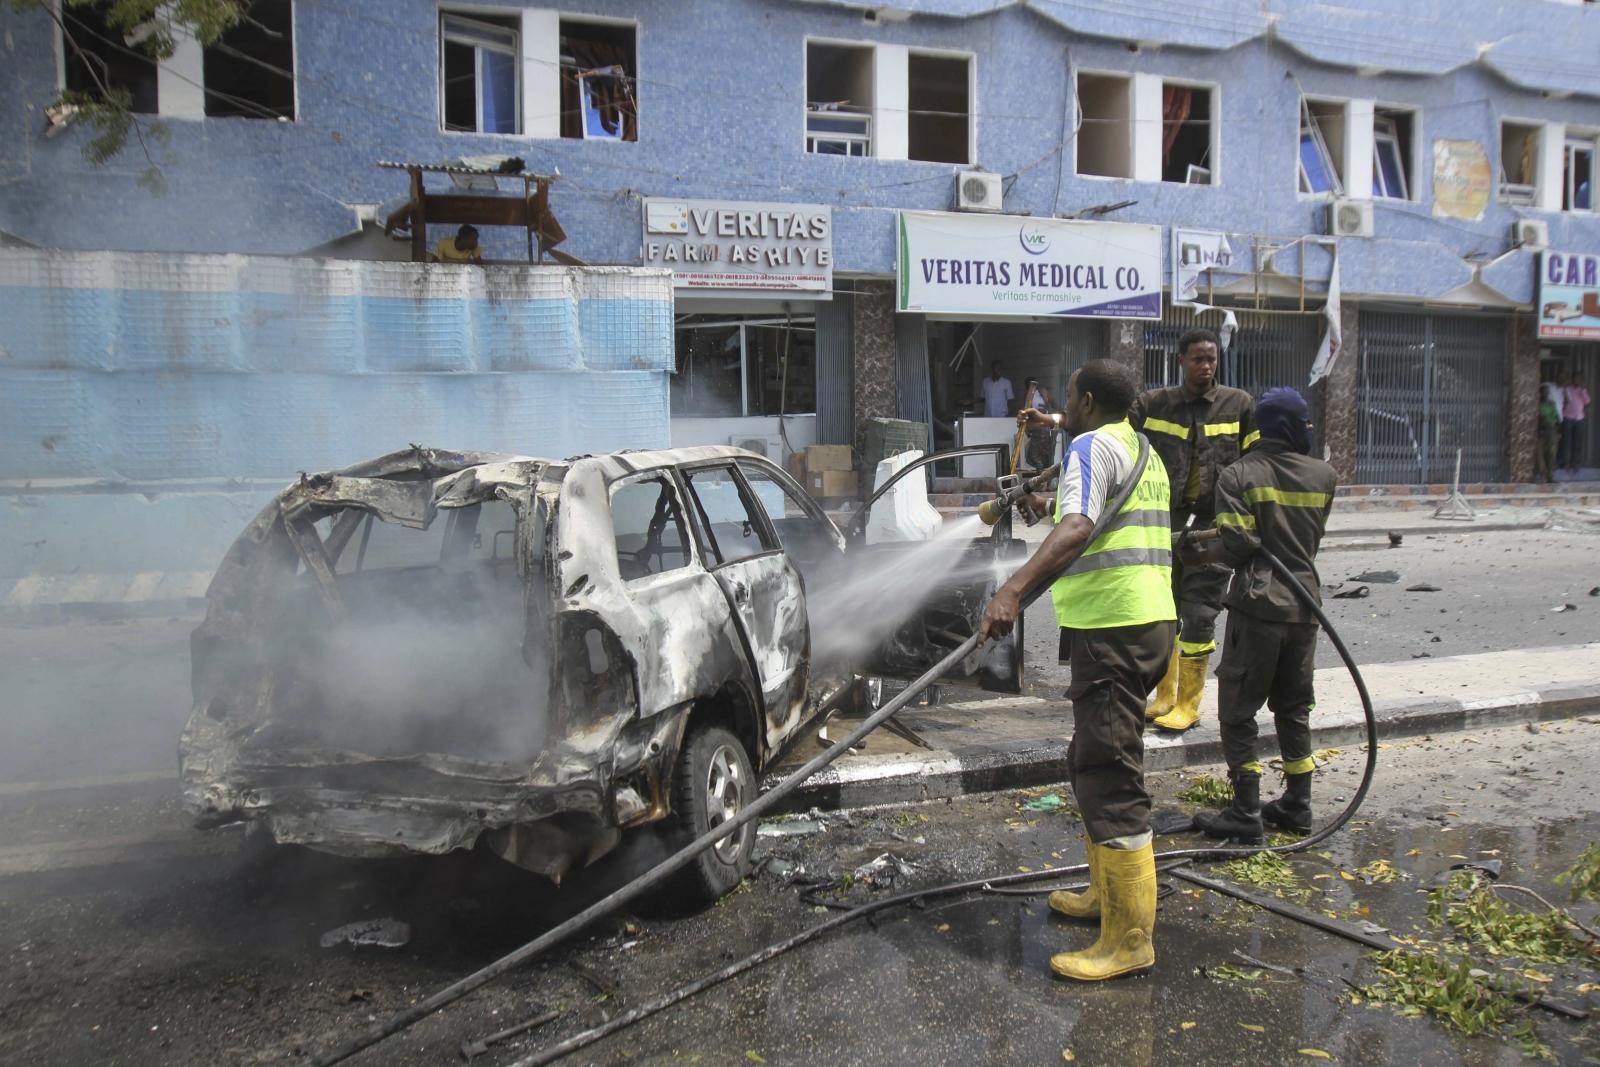 Wybuch samochodu-bomby w Somalii. Fot. PAP/EPA/SAID YUSUF WARSAME